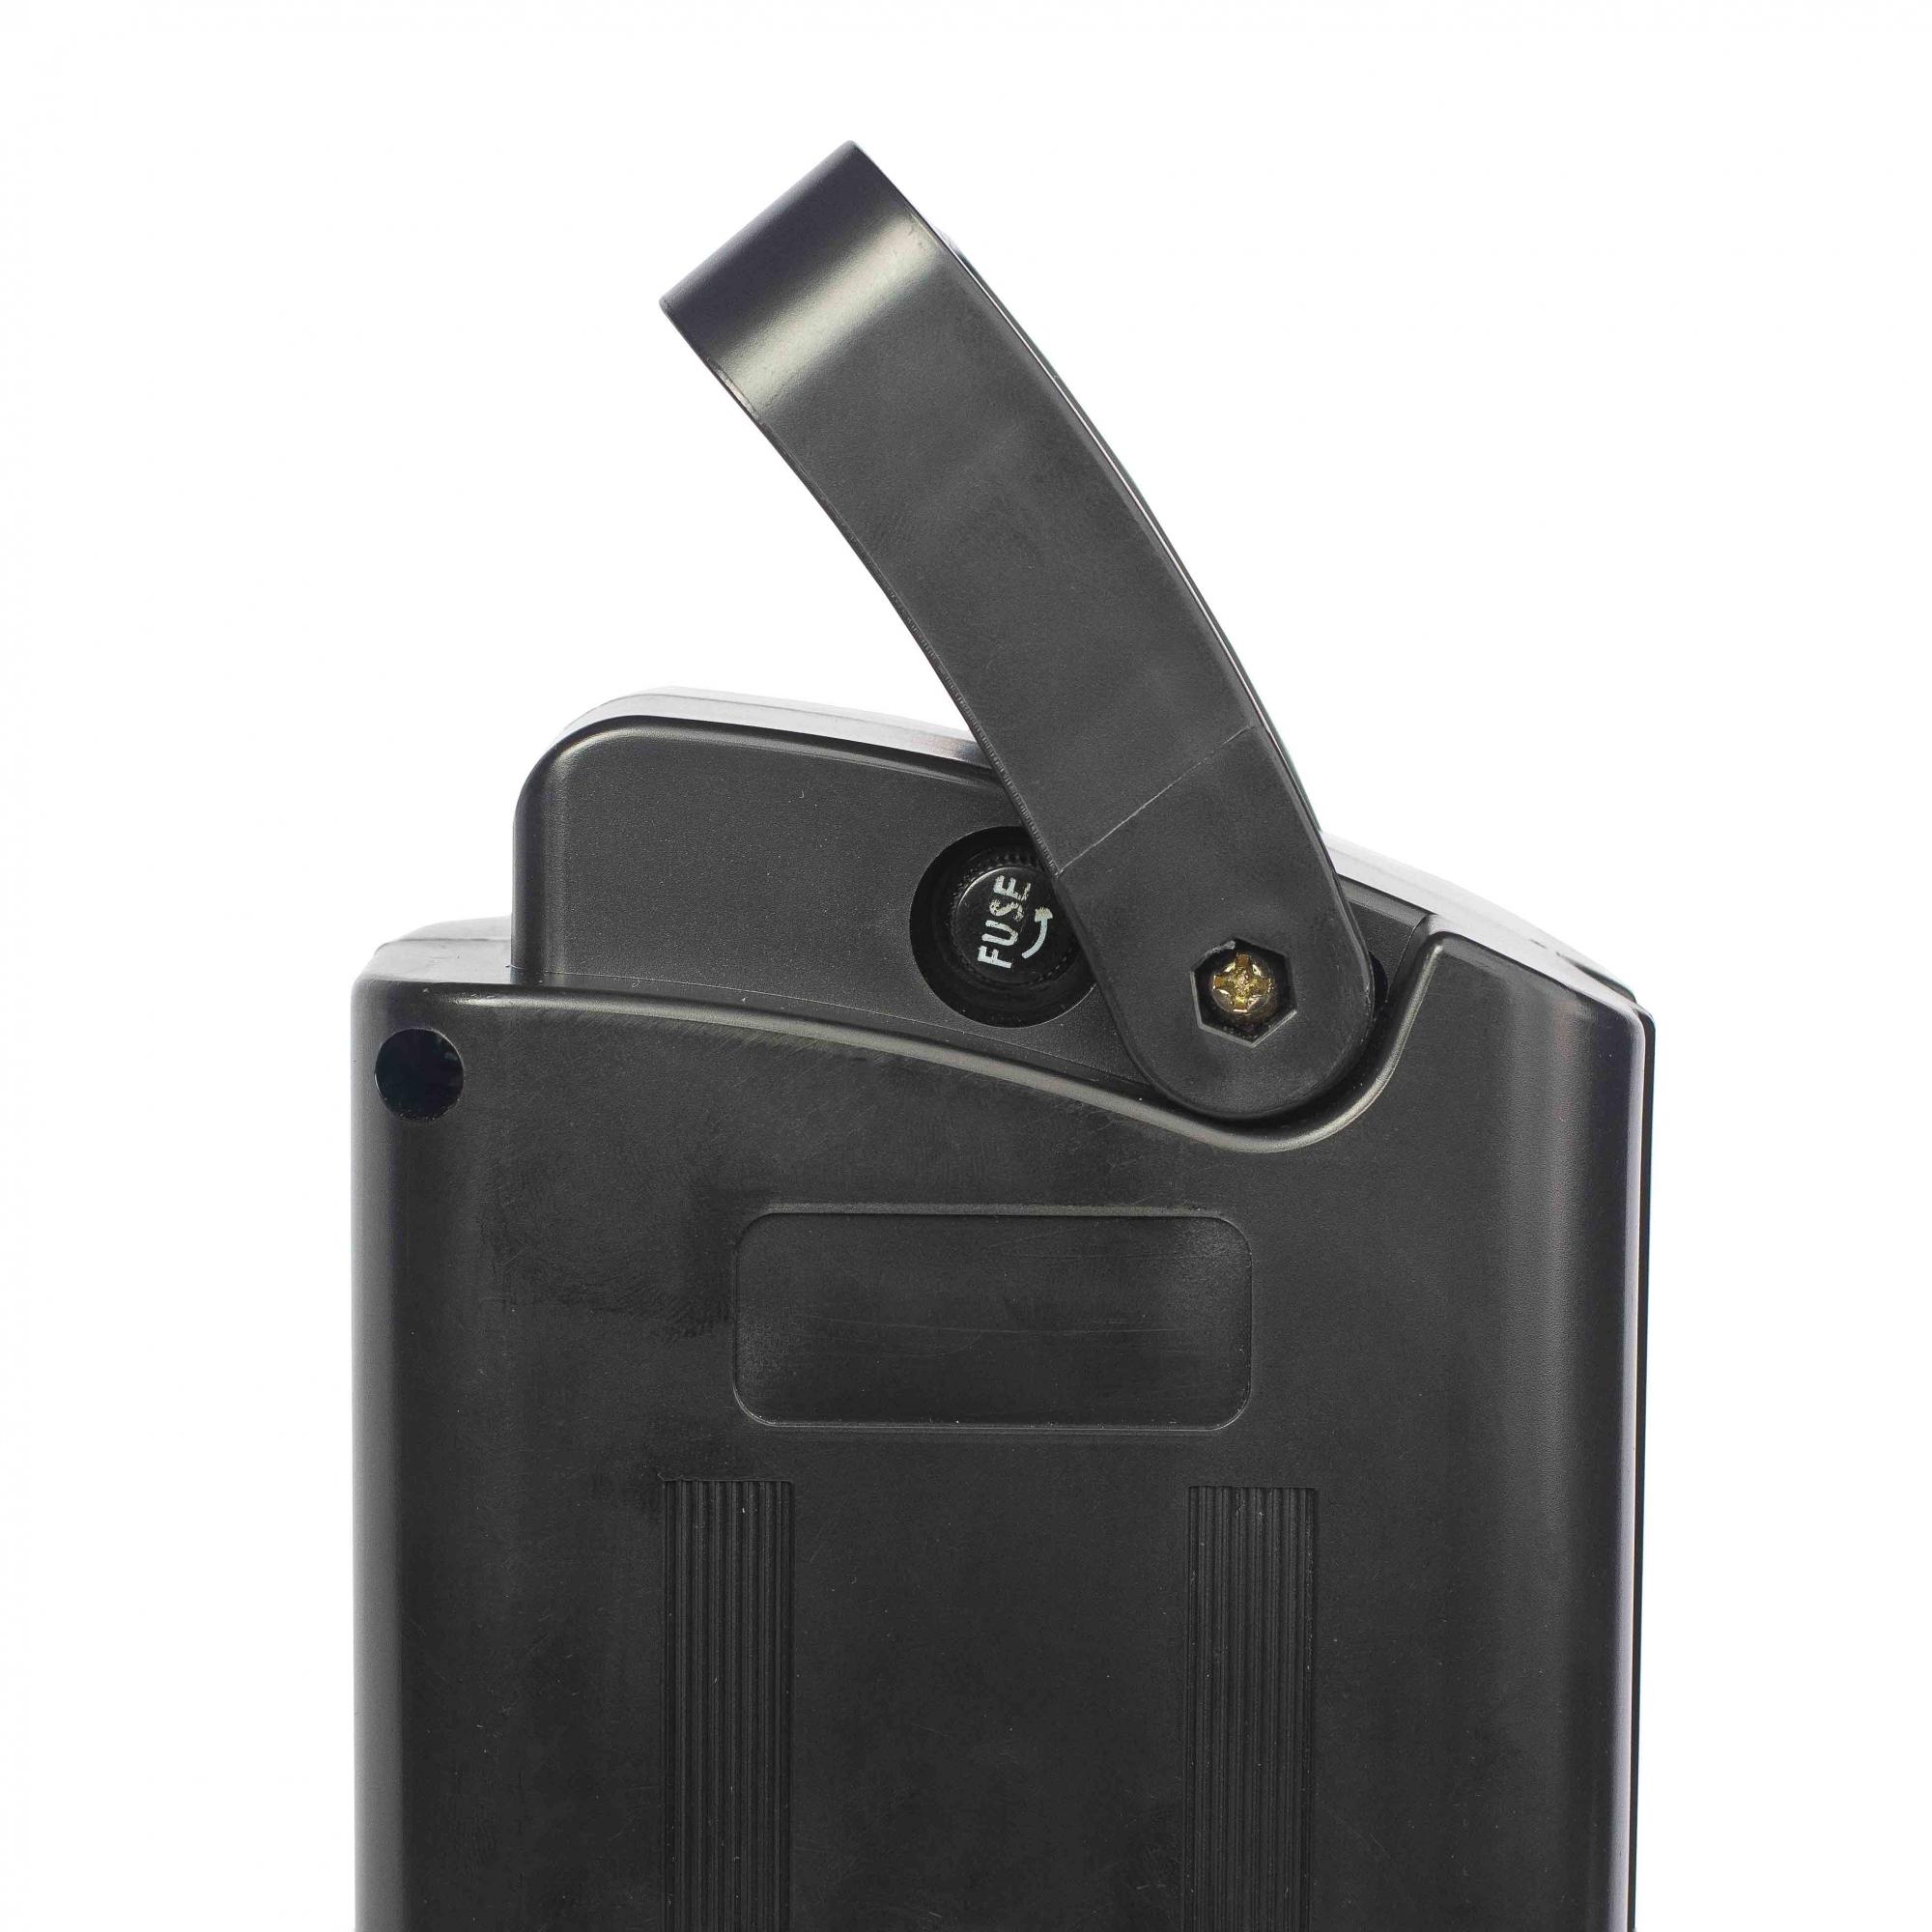 Caixa de Bateria STYLE BASIC